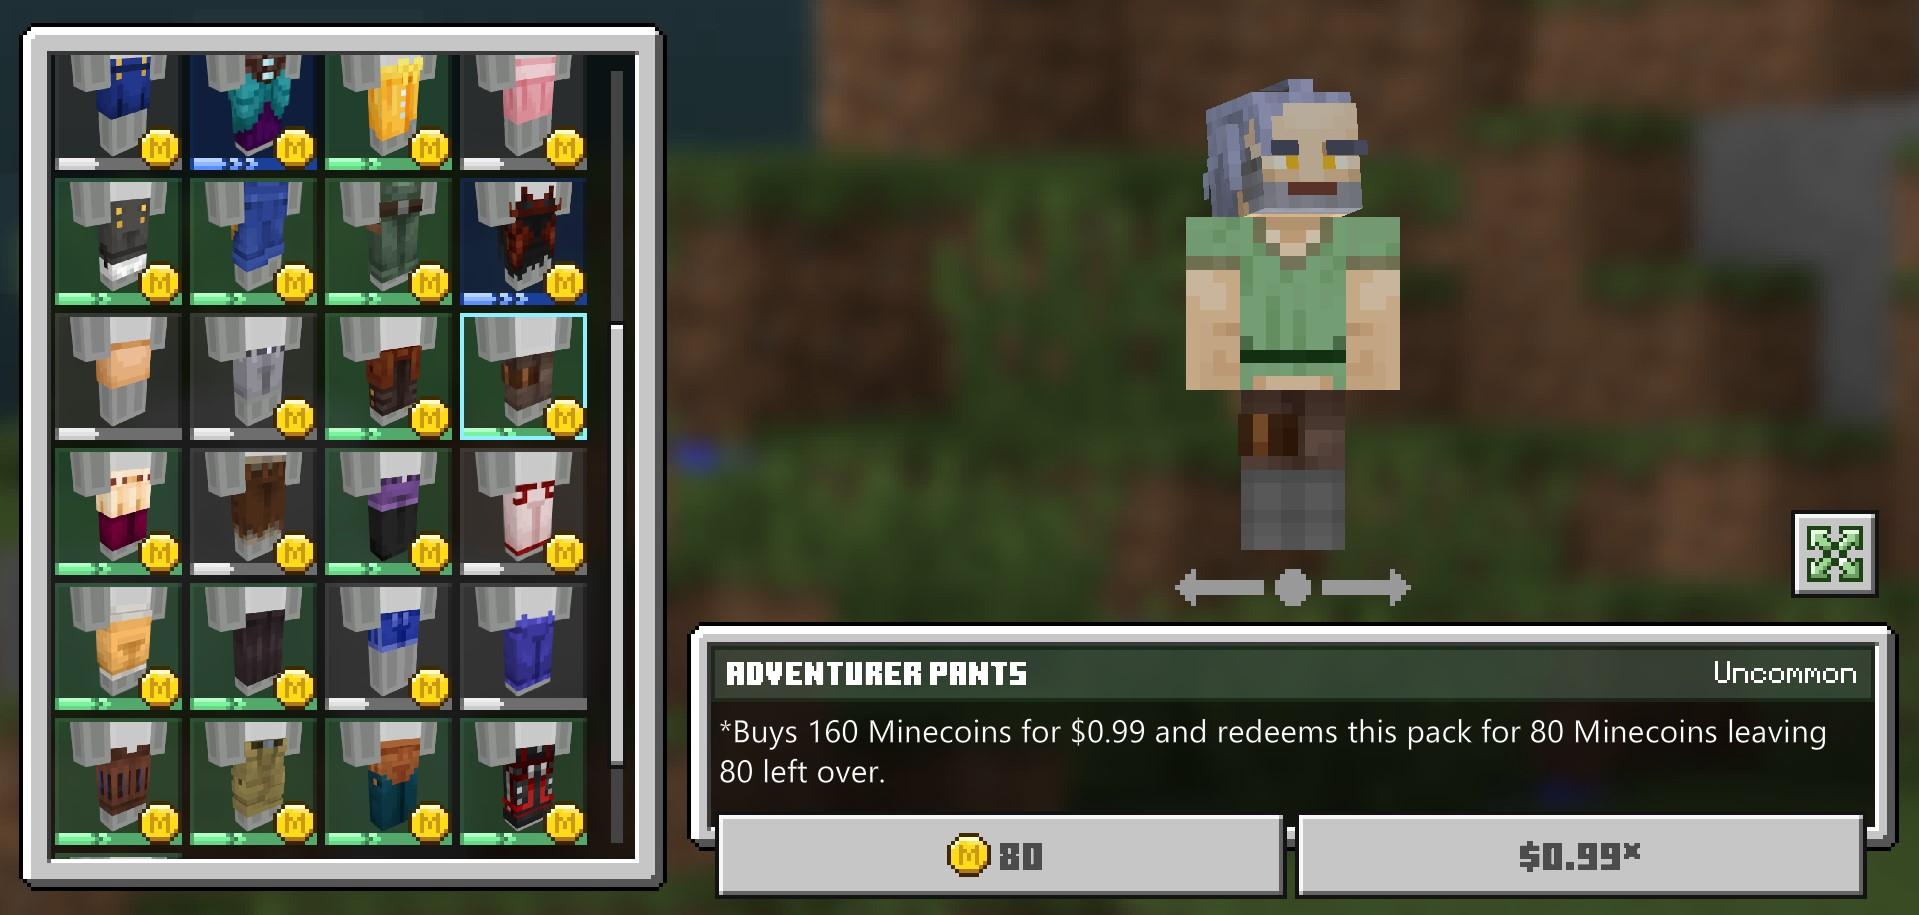 Minecraft character creator will sync between Windows 8 PC